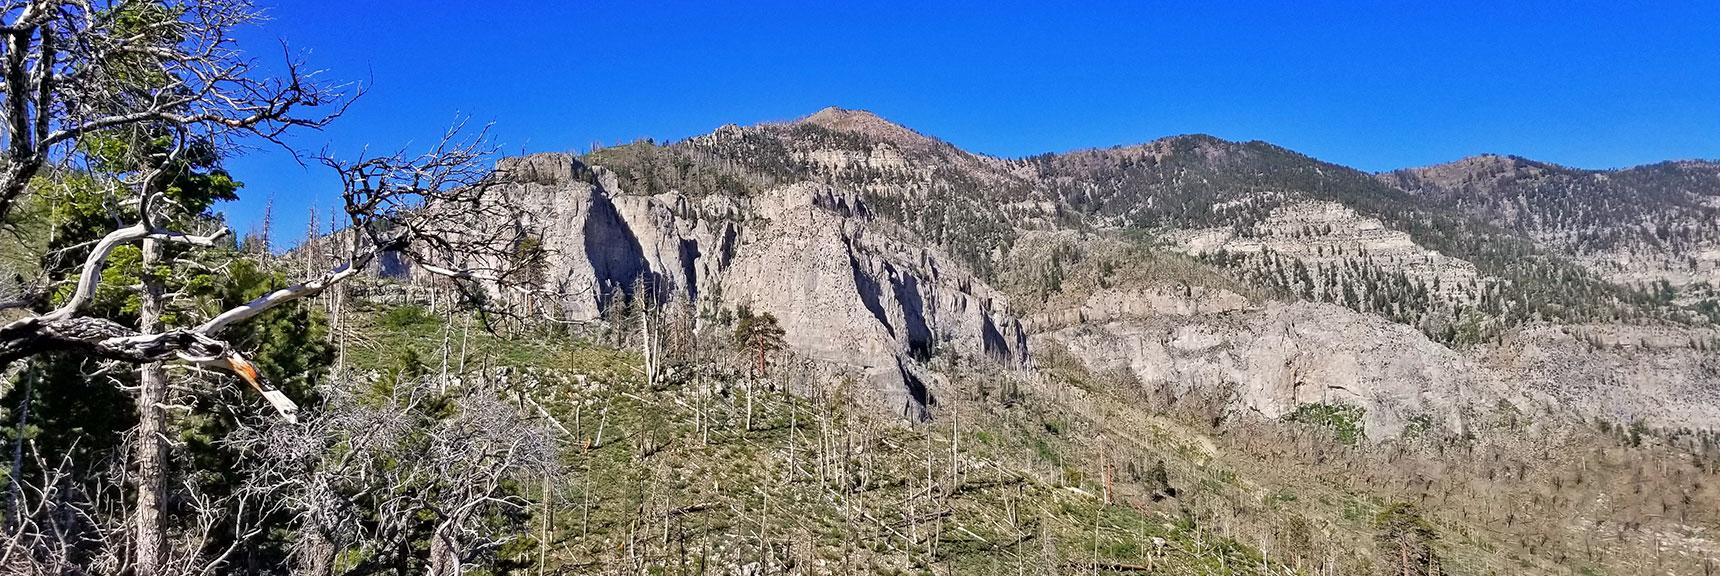 View Across to Griffith Peak North Ridge from Harris Mountain Approach Ridge | Harris Mountain Griffith Peak Circuit in Mt. Charleston Wilderness, Nevada